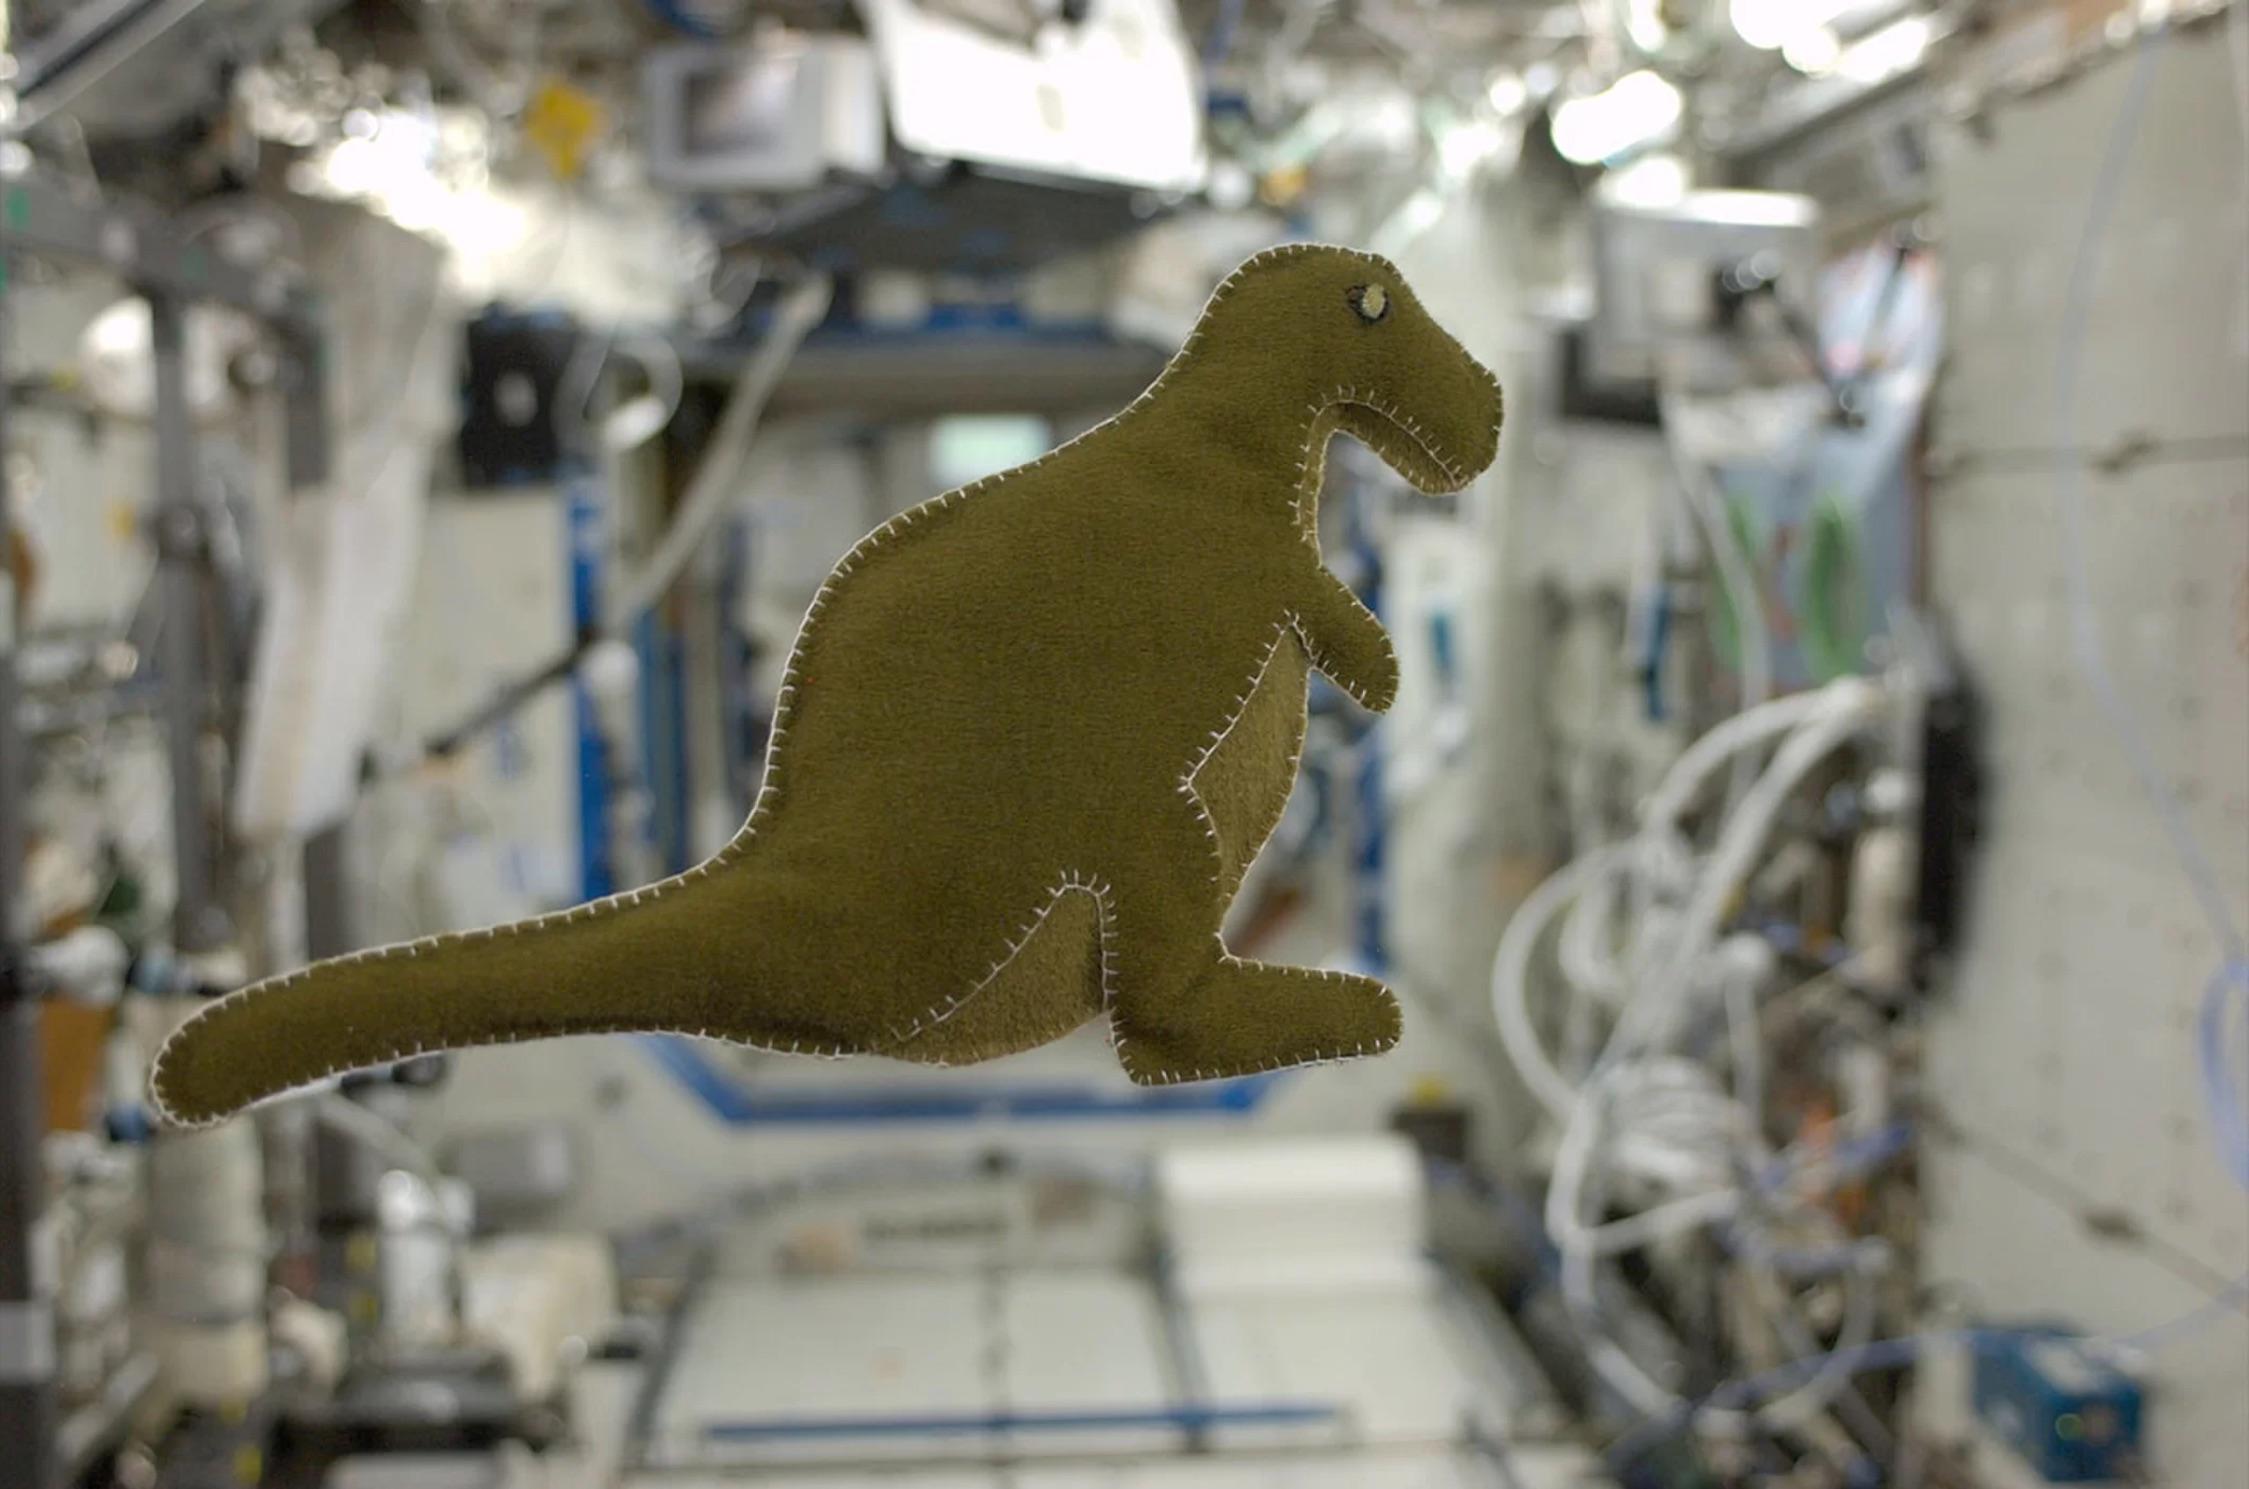 Karen Nyberg's fantastic stuffed dinosaur